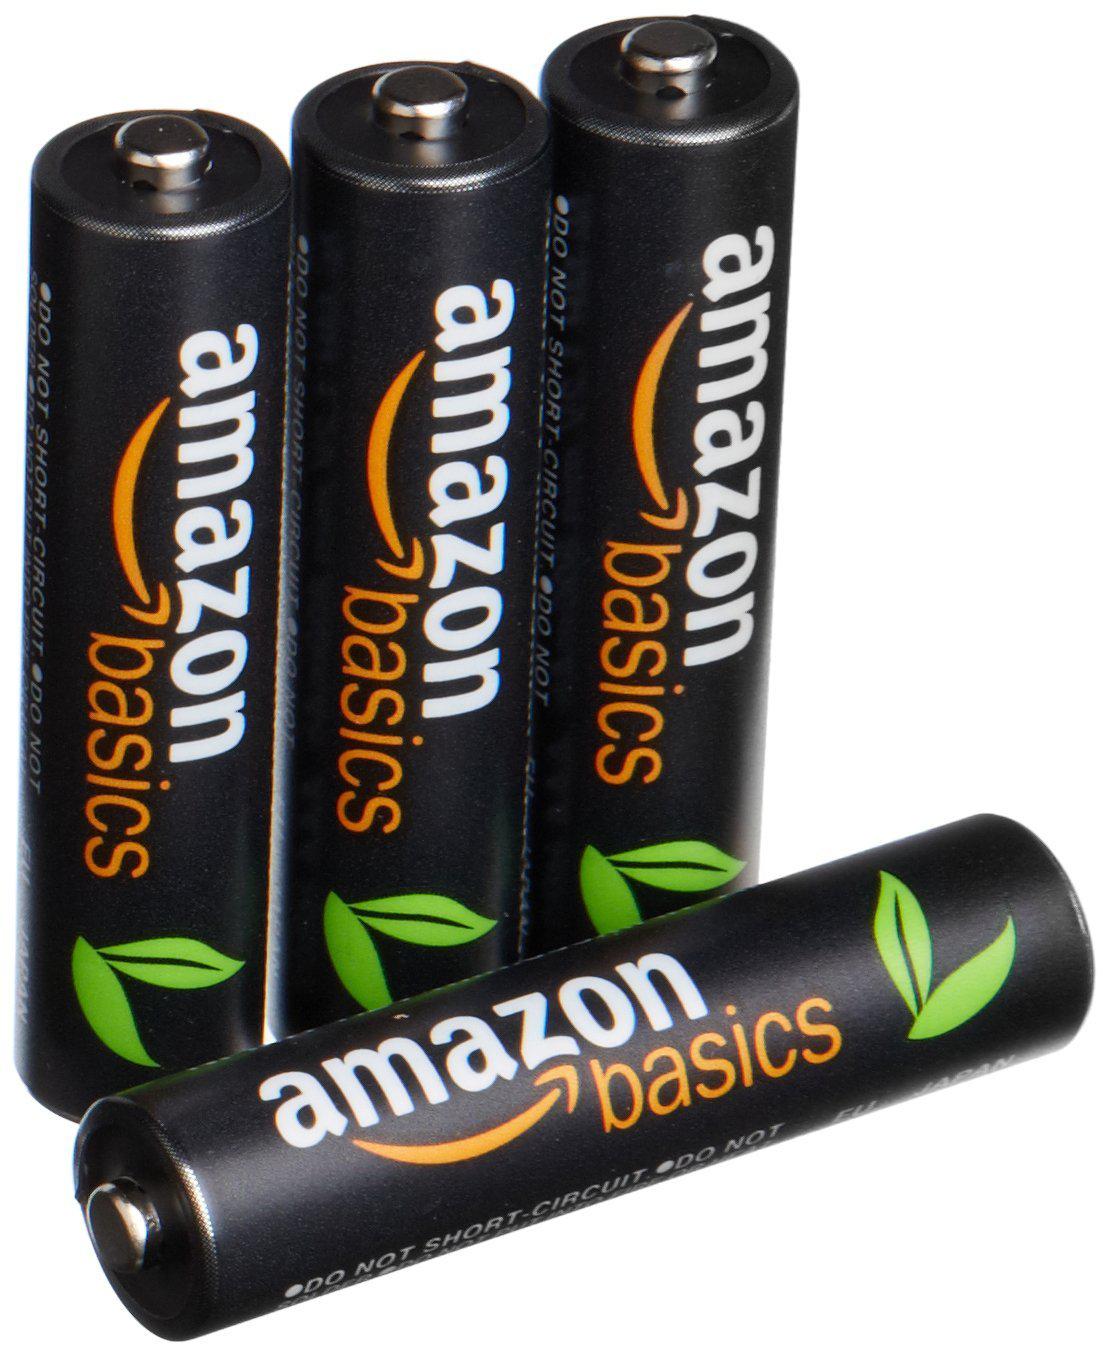 Lot de 4 piles (AAA) rechargeables AmazonBasics 850 mAh/800 mAh min